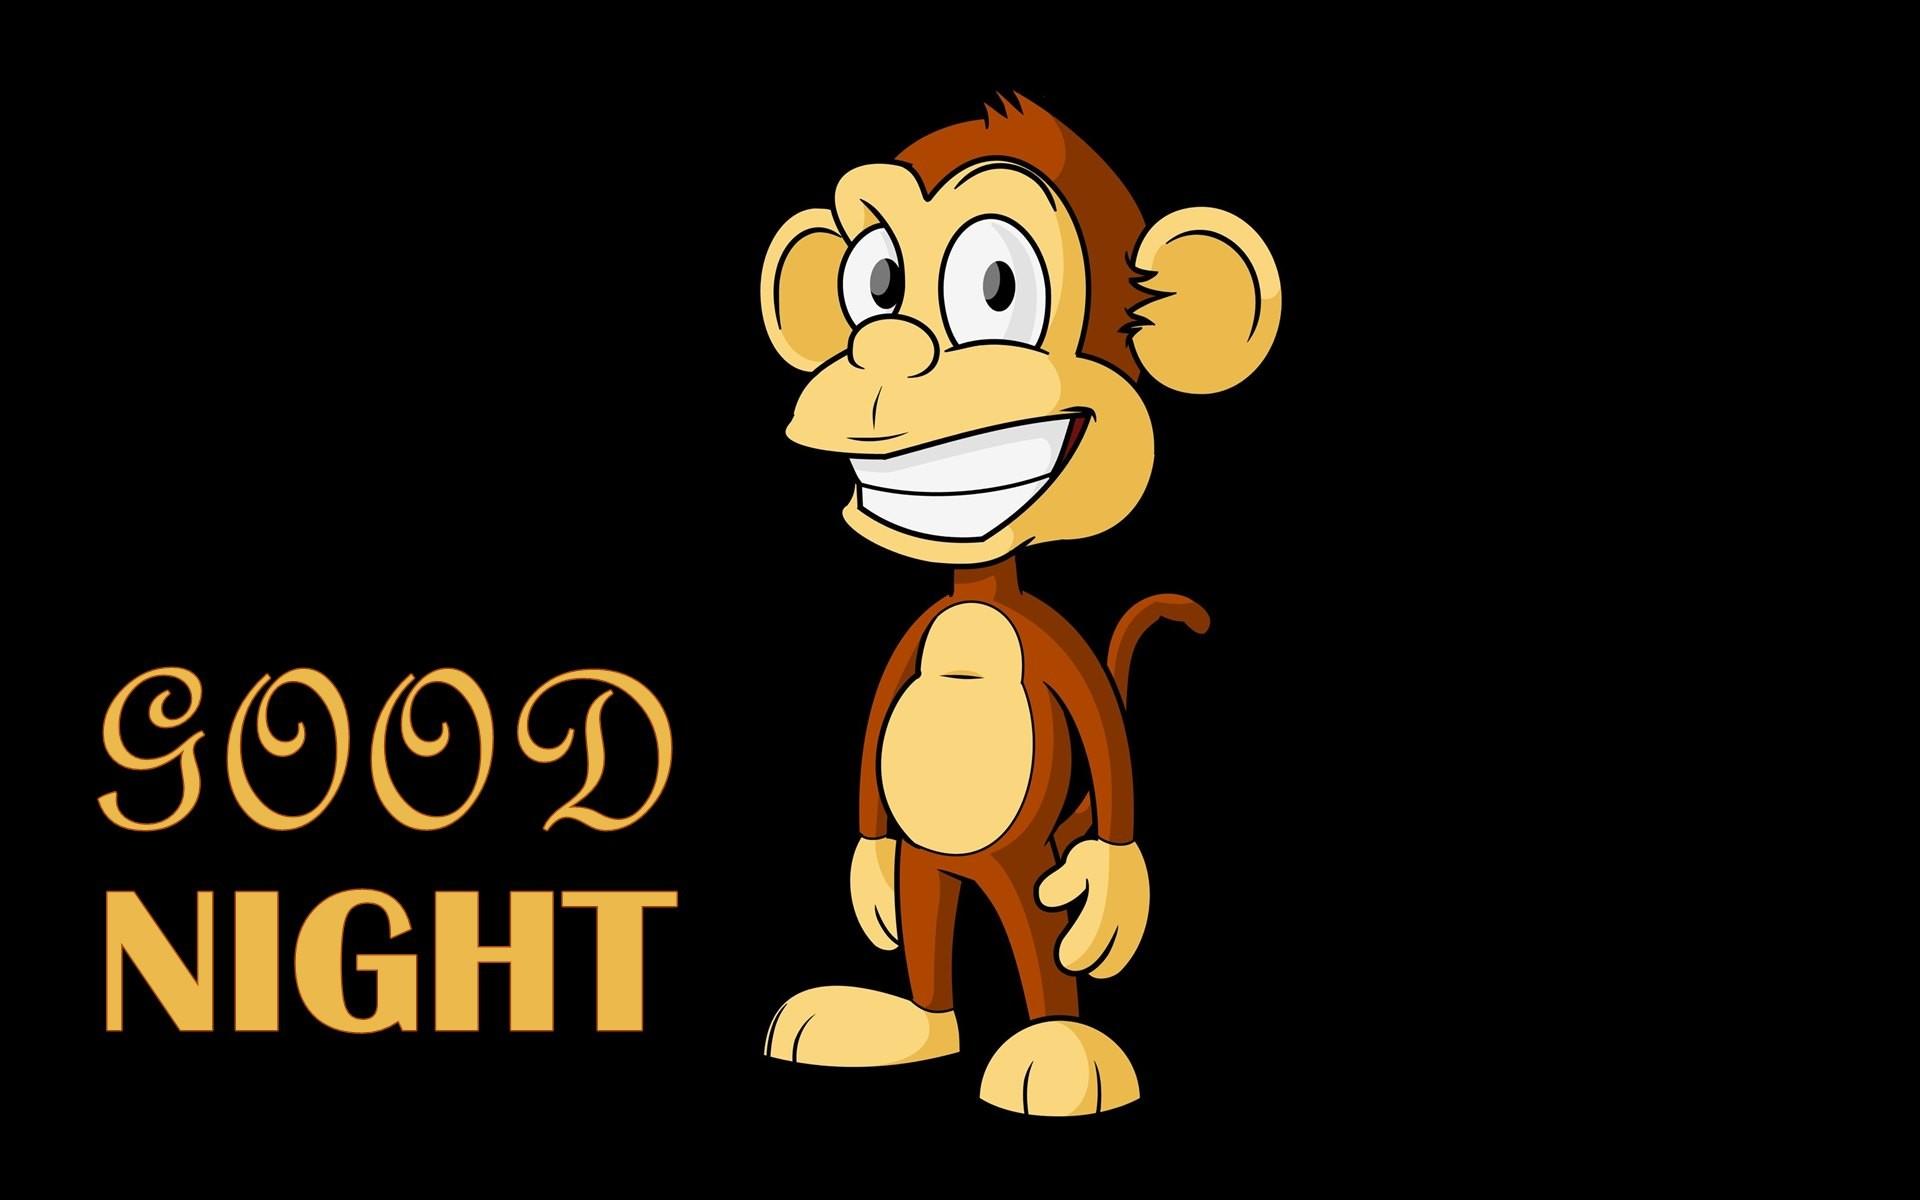 Animated Monkey Wallpaper 61 images